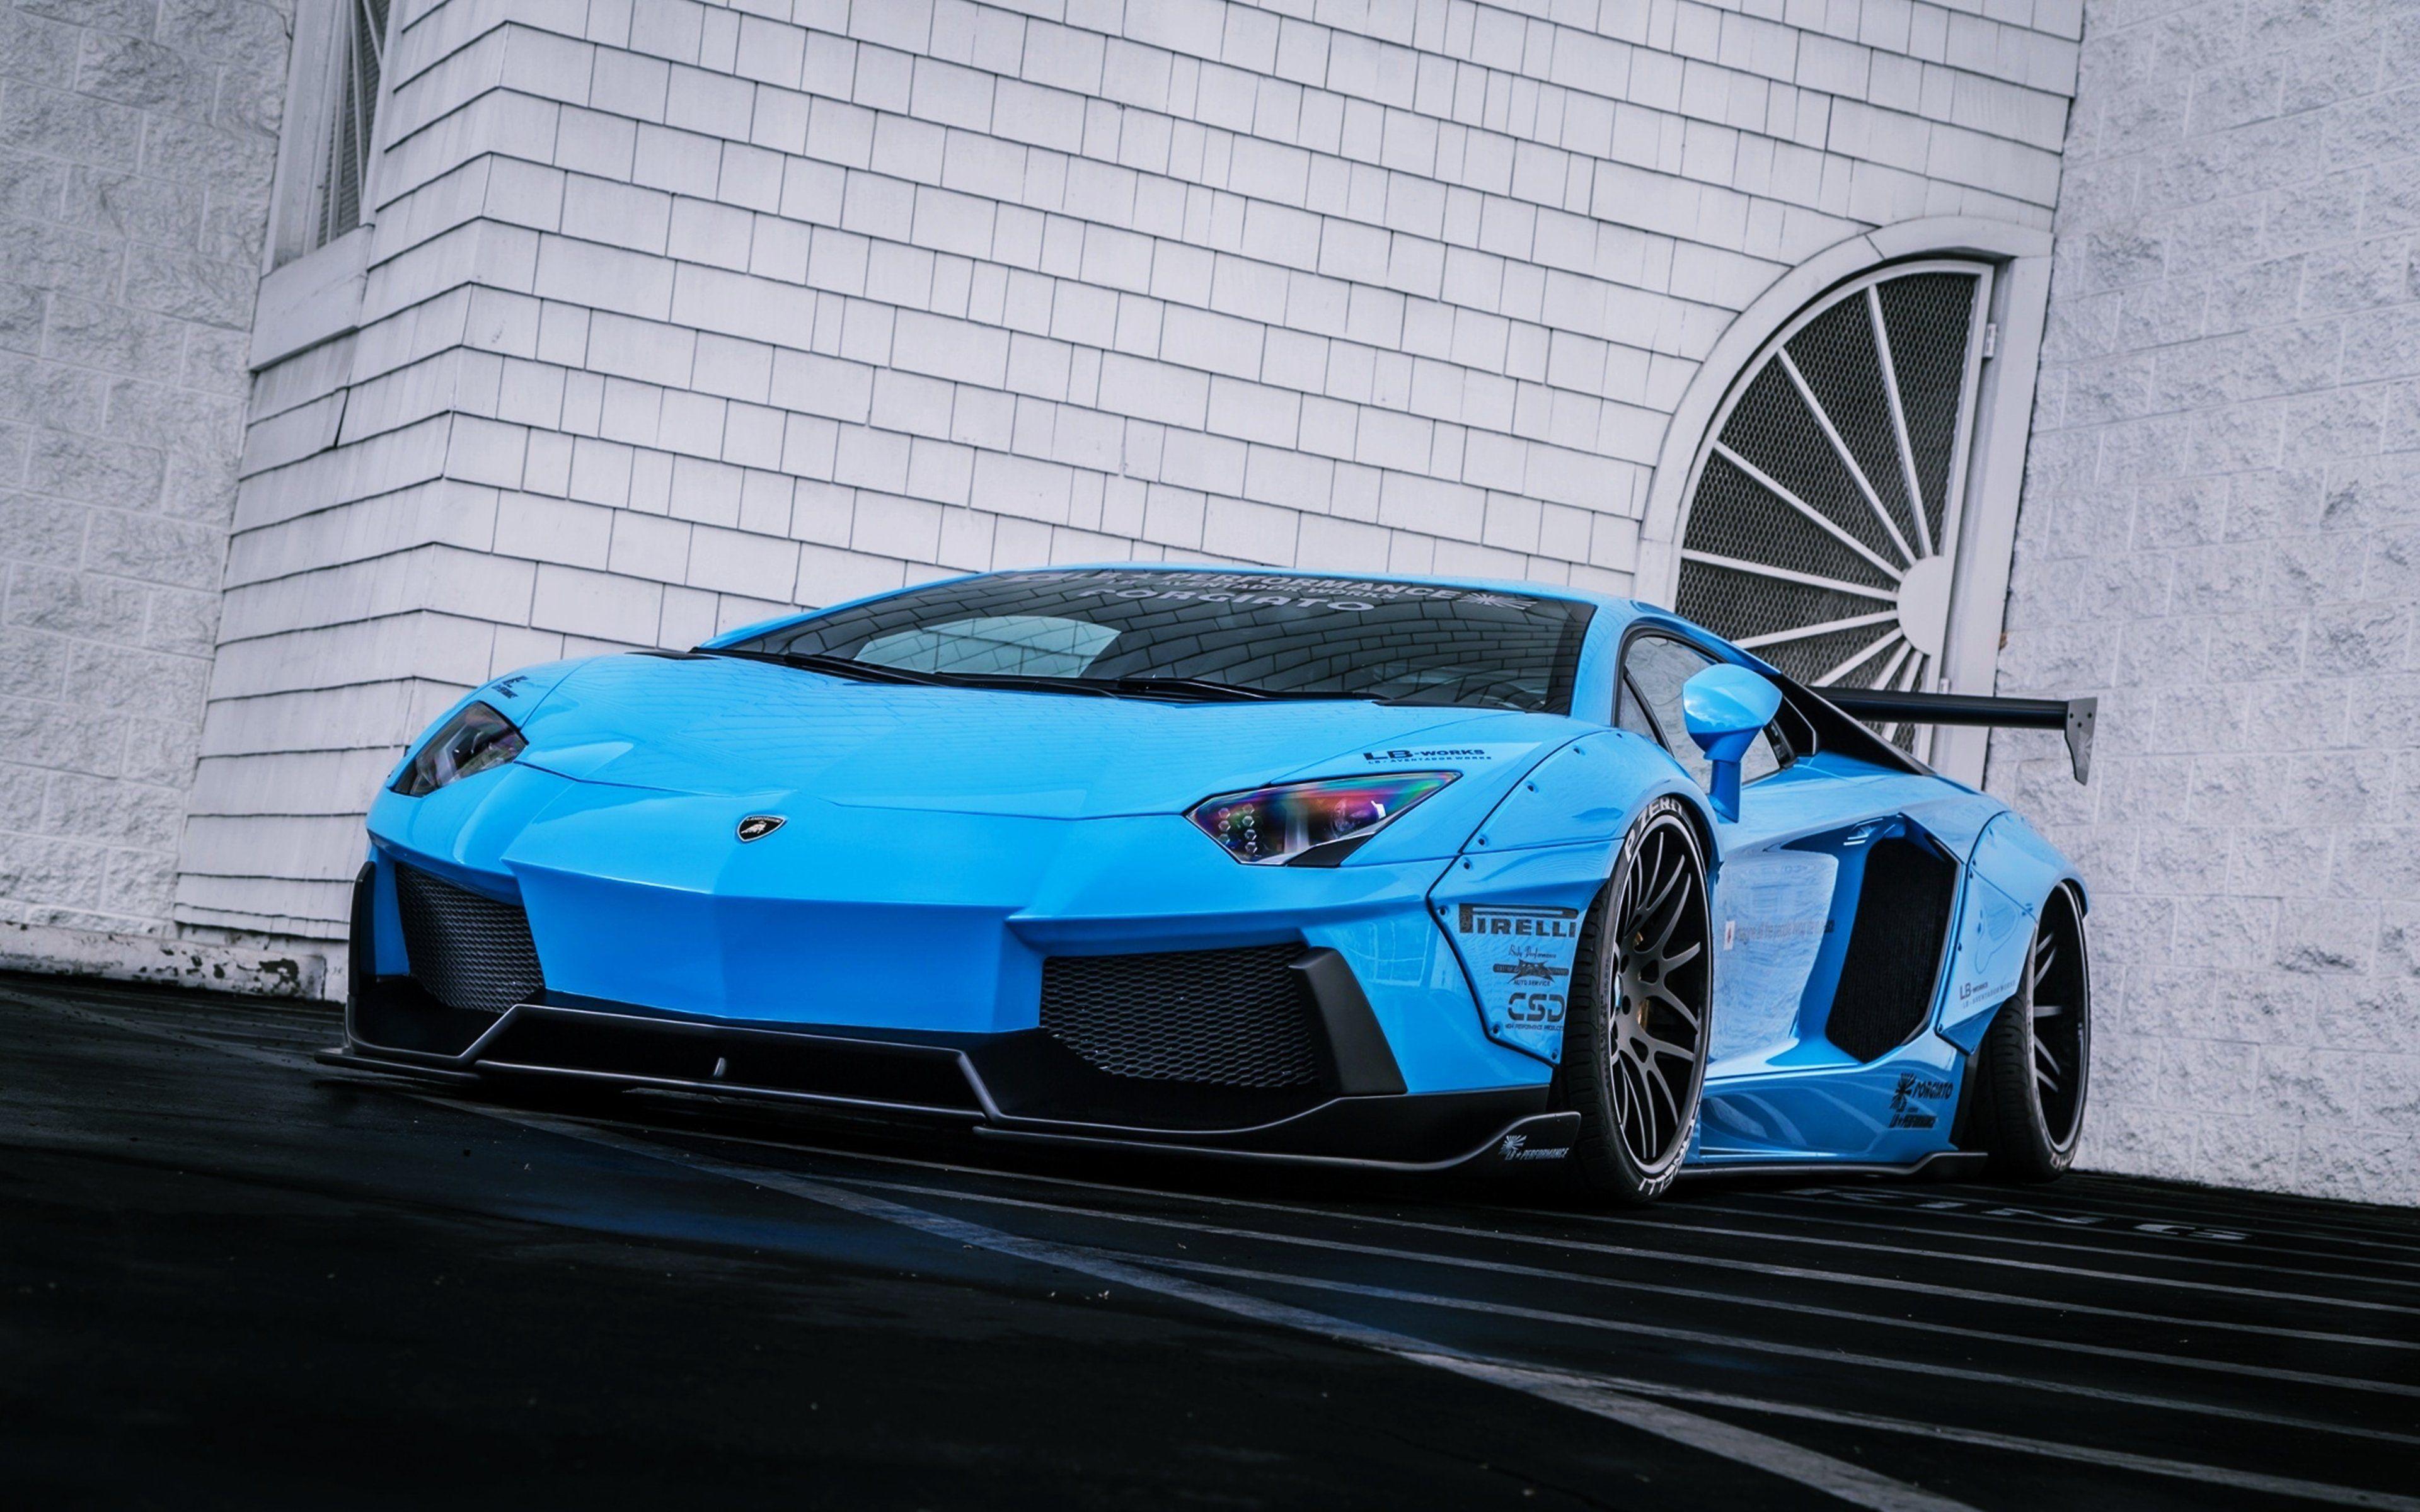 lamborghini aventador lb lamborghini aventador lp720 4 liberty lb perfomance blue supercar rear